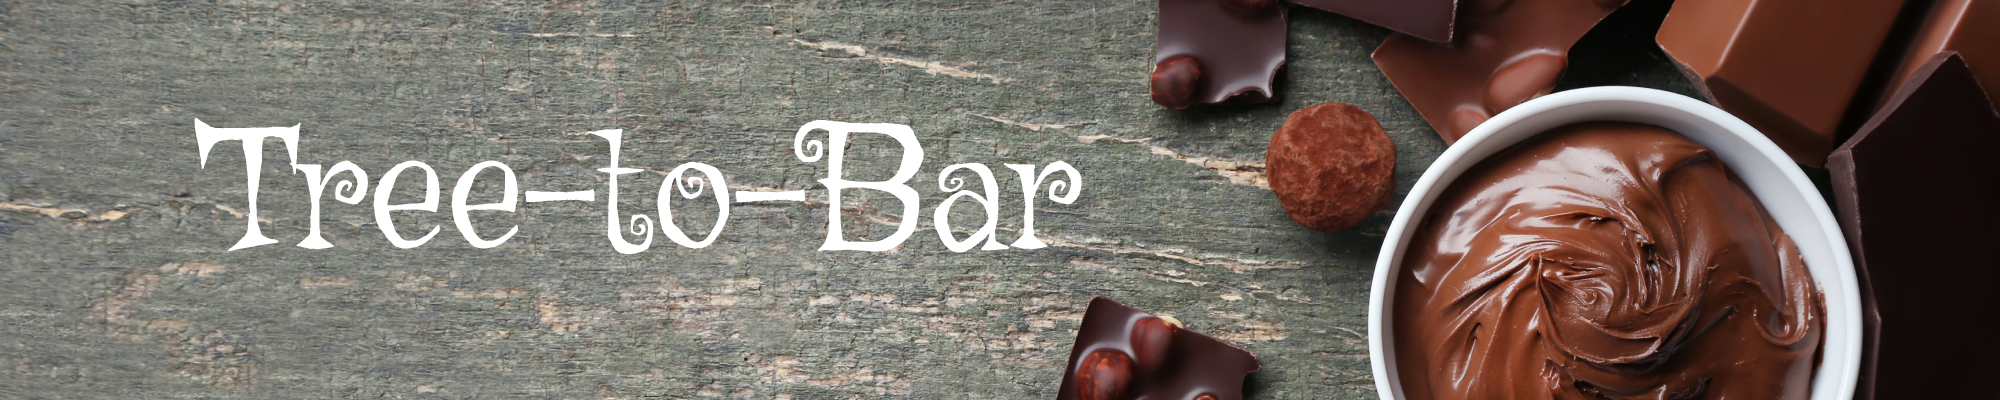 Tree-to-Bar-Chocolate